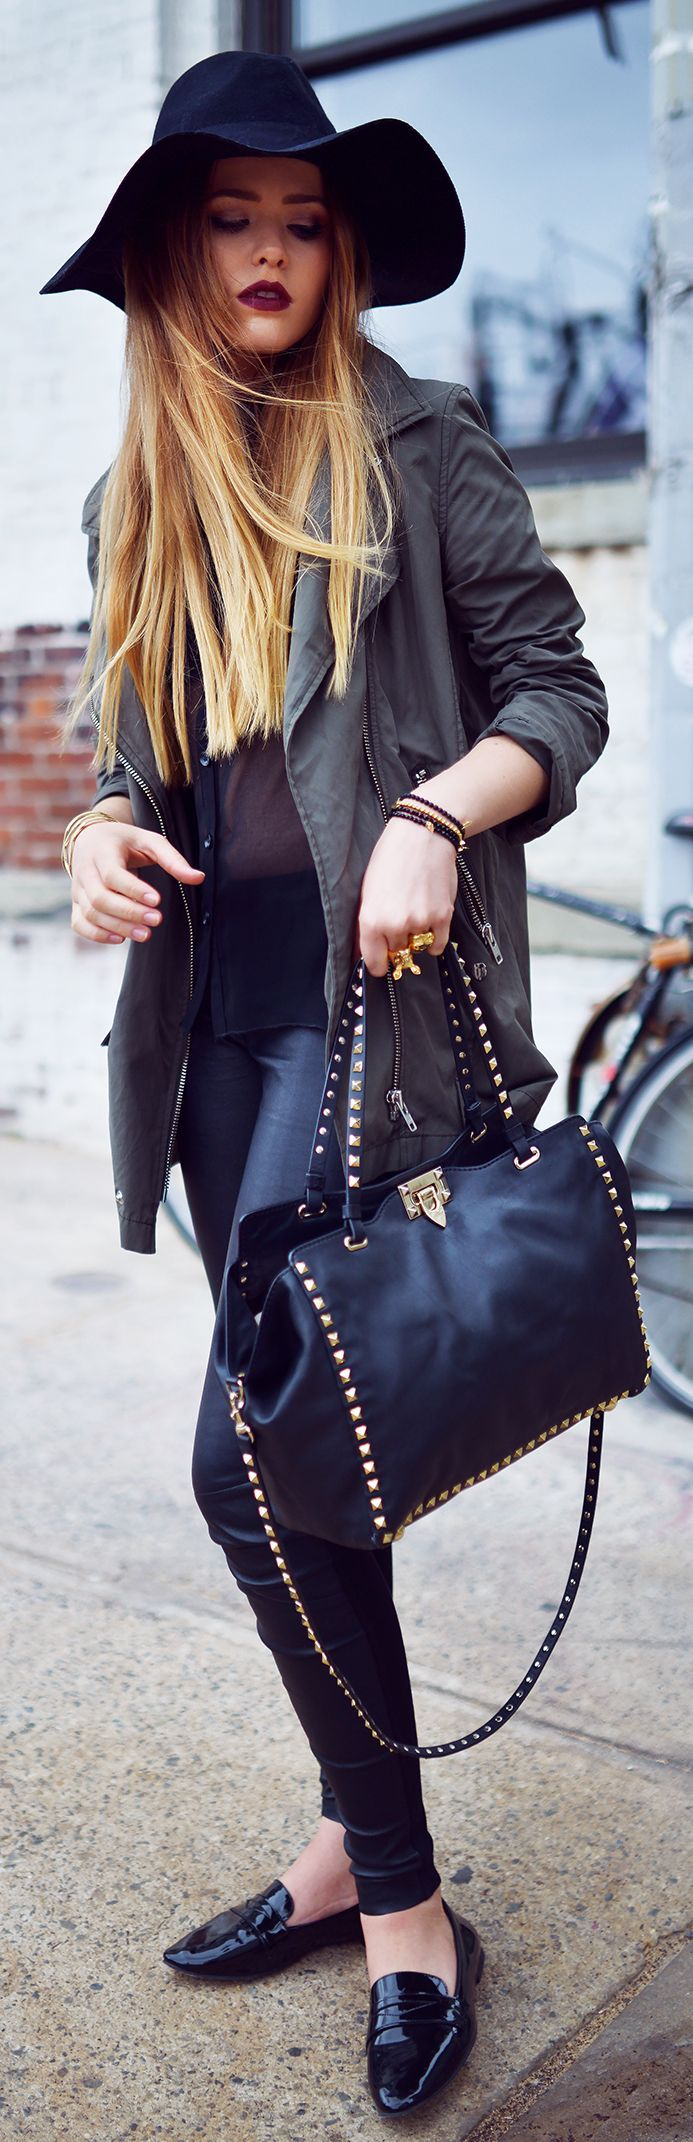 Zara Bright Black Lady Pointy Toe Flats by Kayture